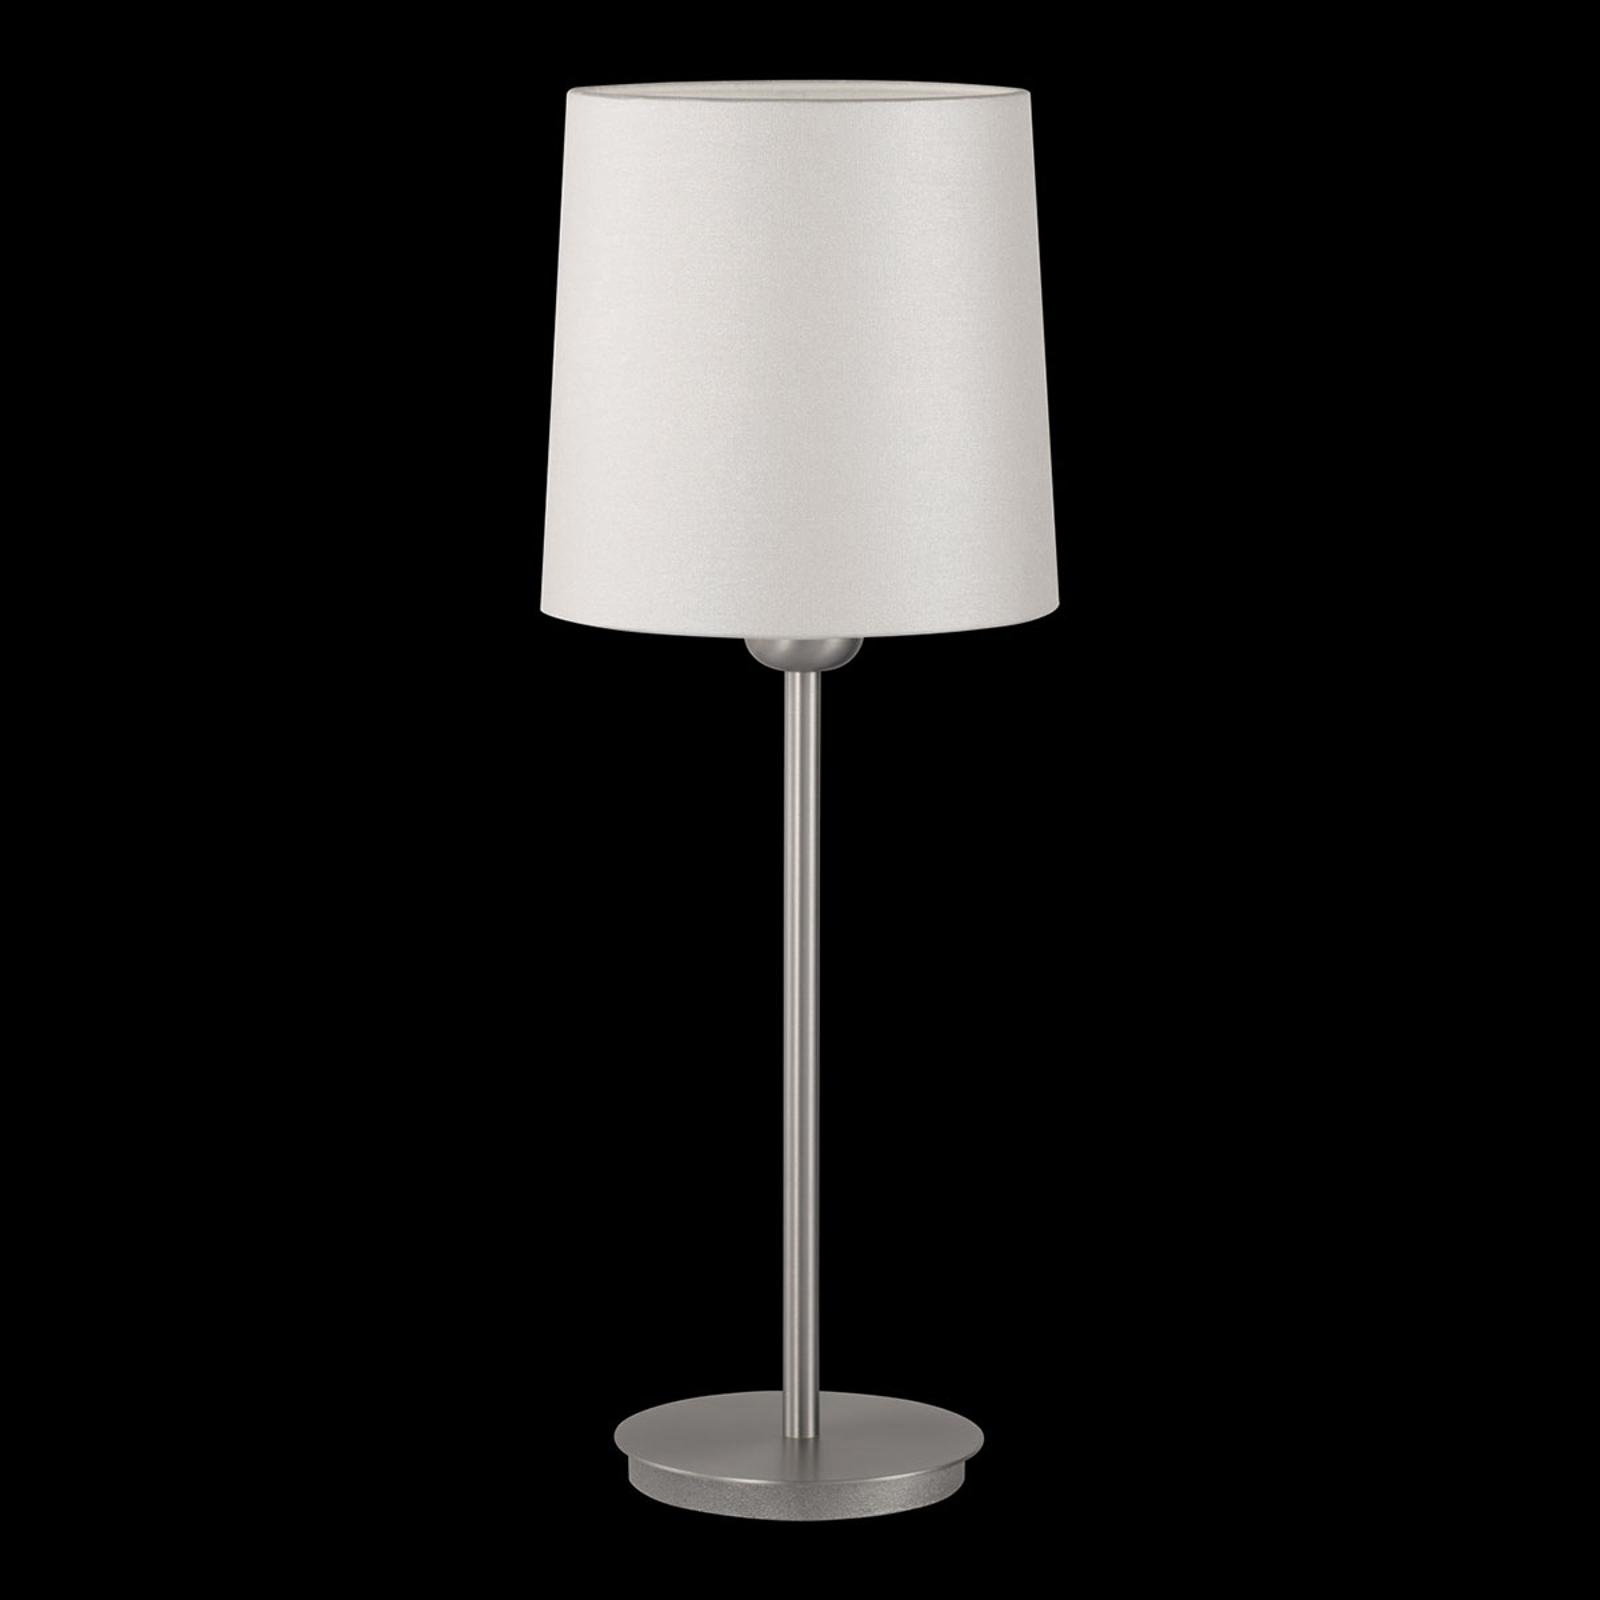 Tafellamp Havanna met parelmoereffect crèmewit